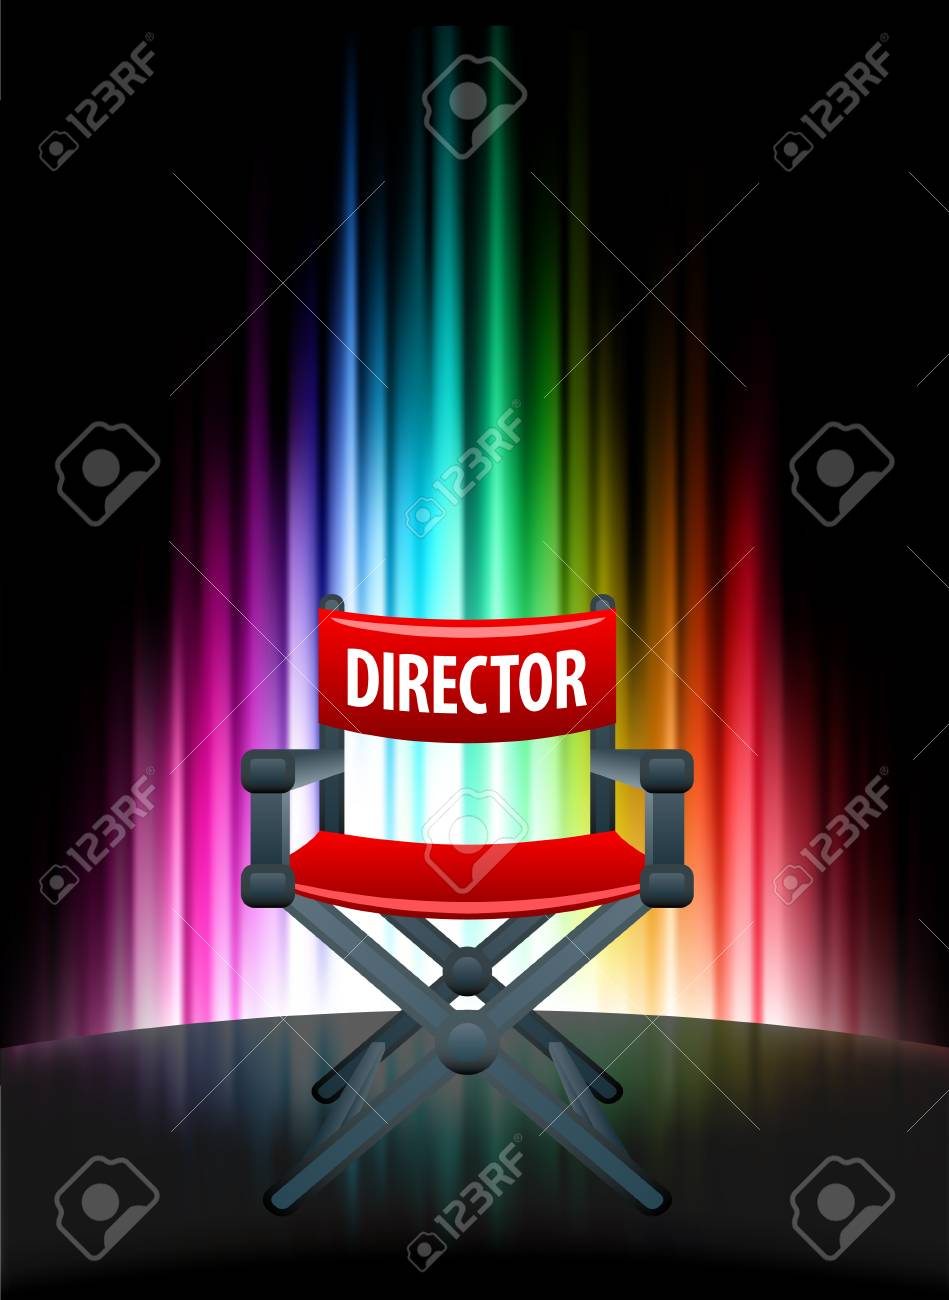 Director Chair on Abstract Spectrum BackgroundOriginal Illustration Stock Vector - 22352937